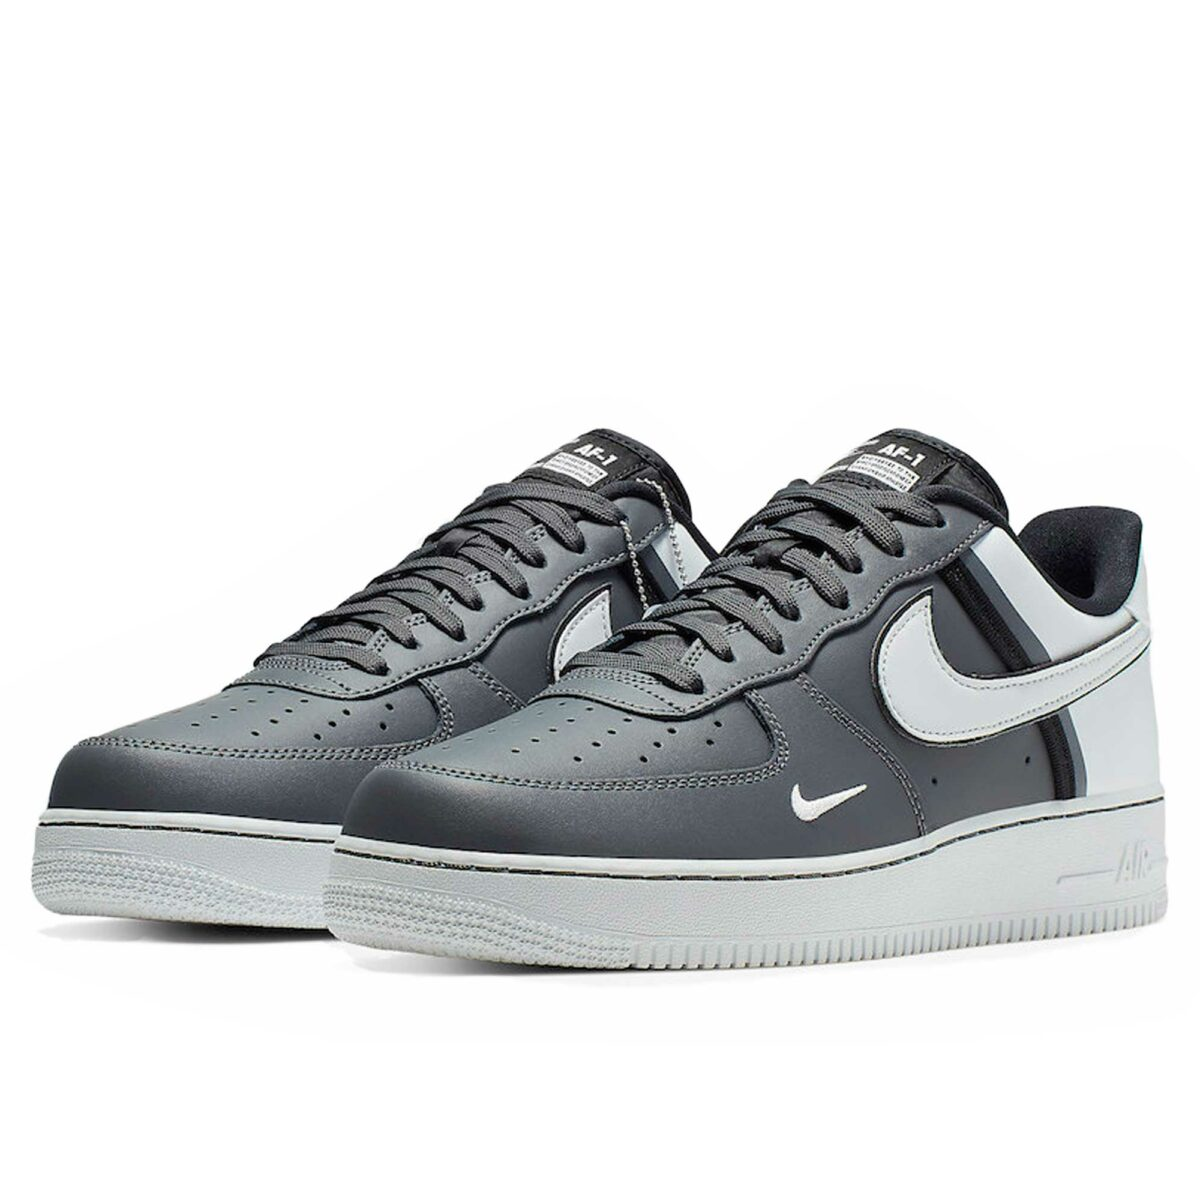 nike air force 1 lv 8 grey white CI0061_002 купить